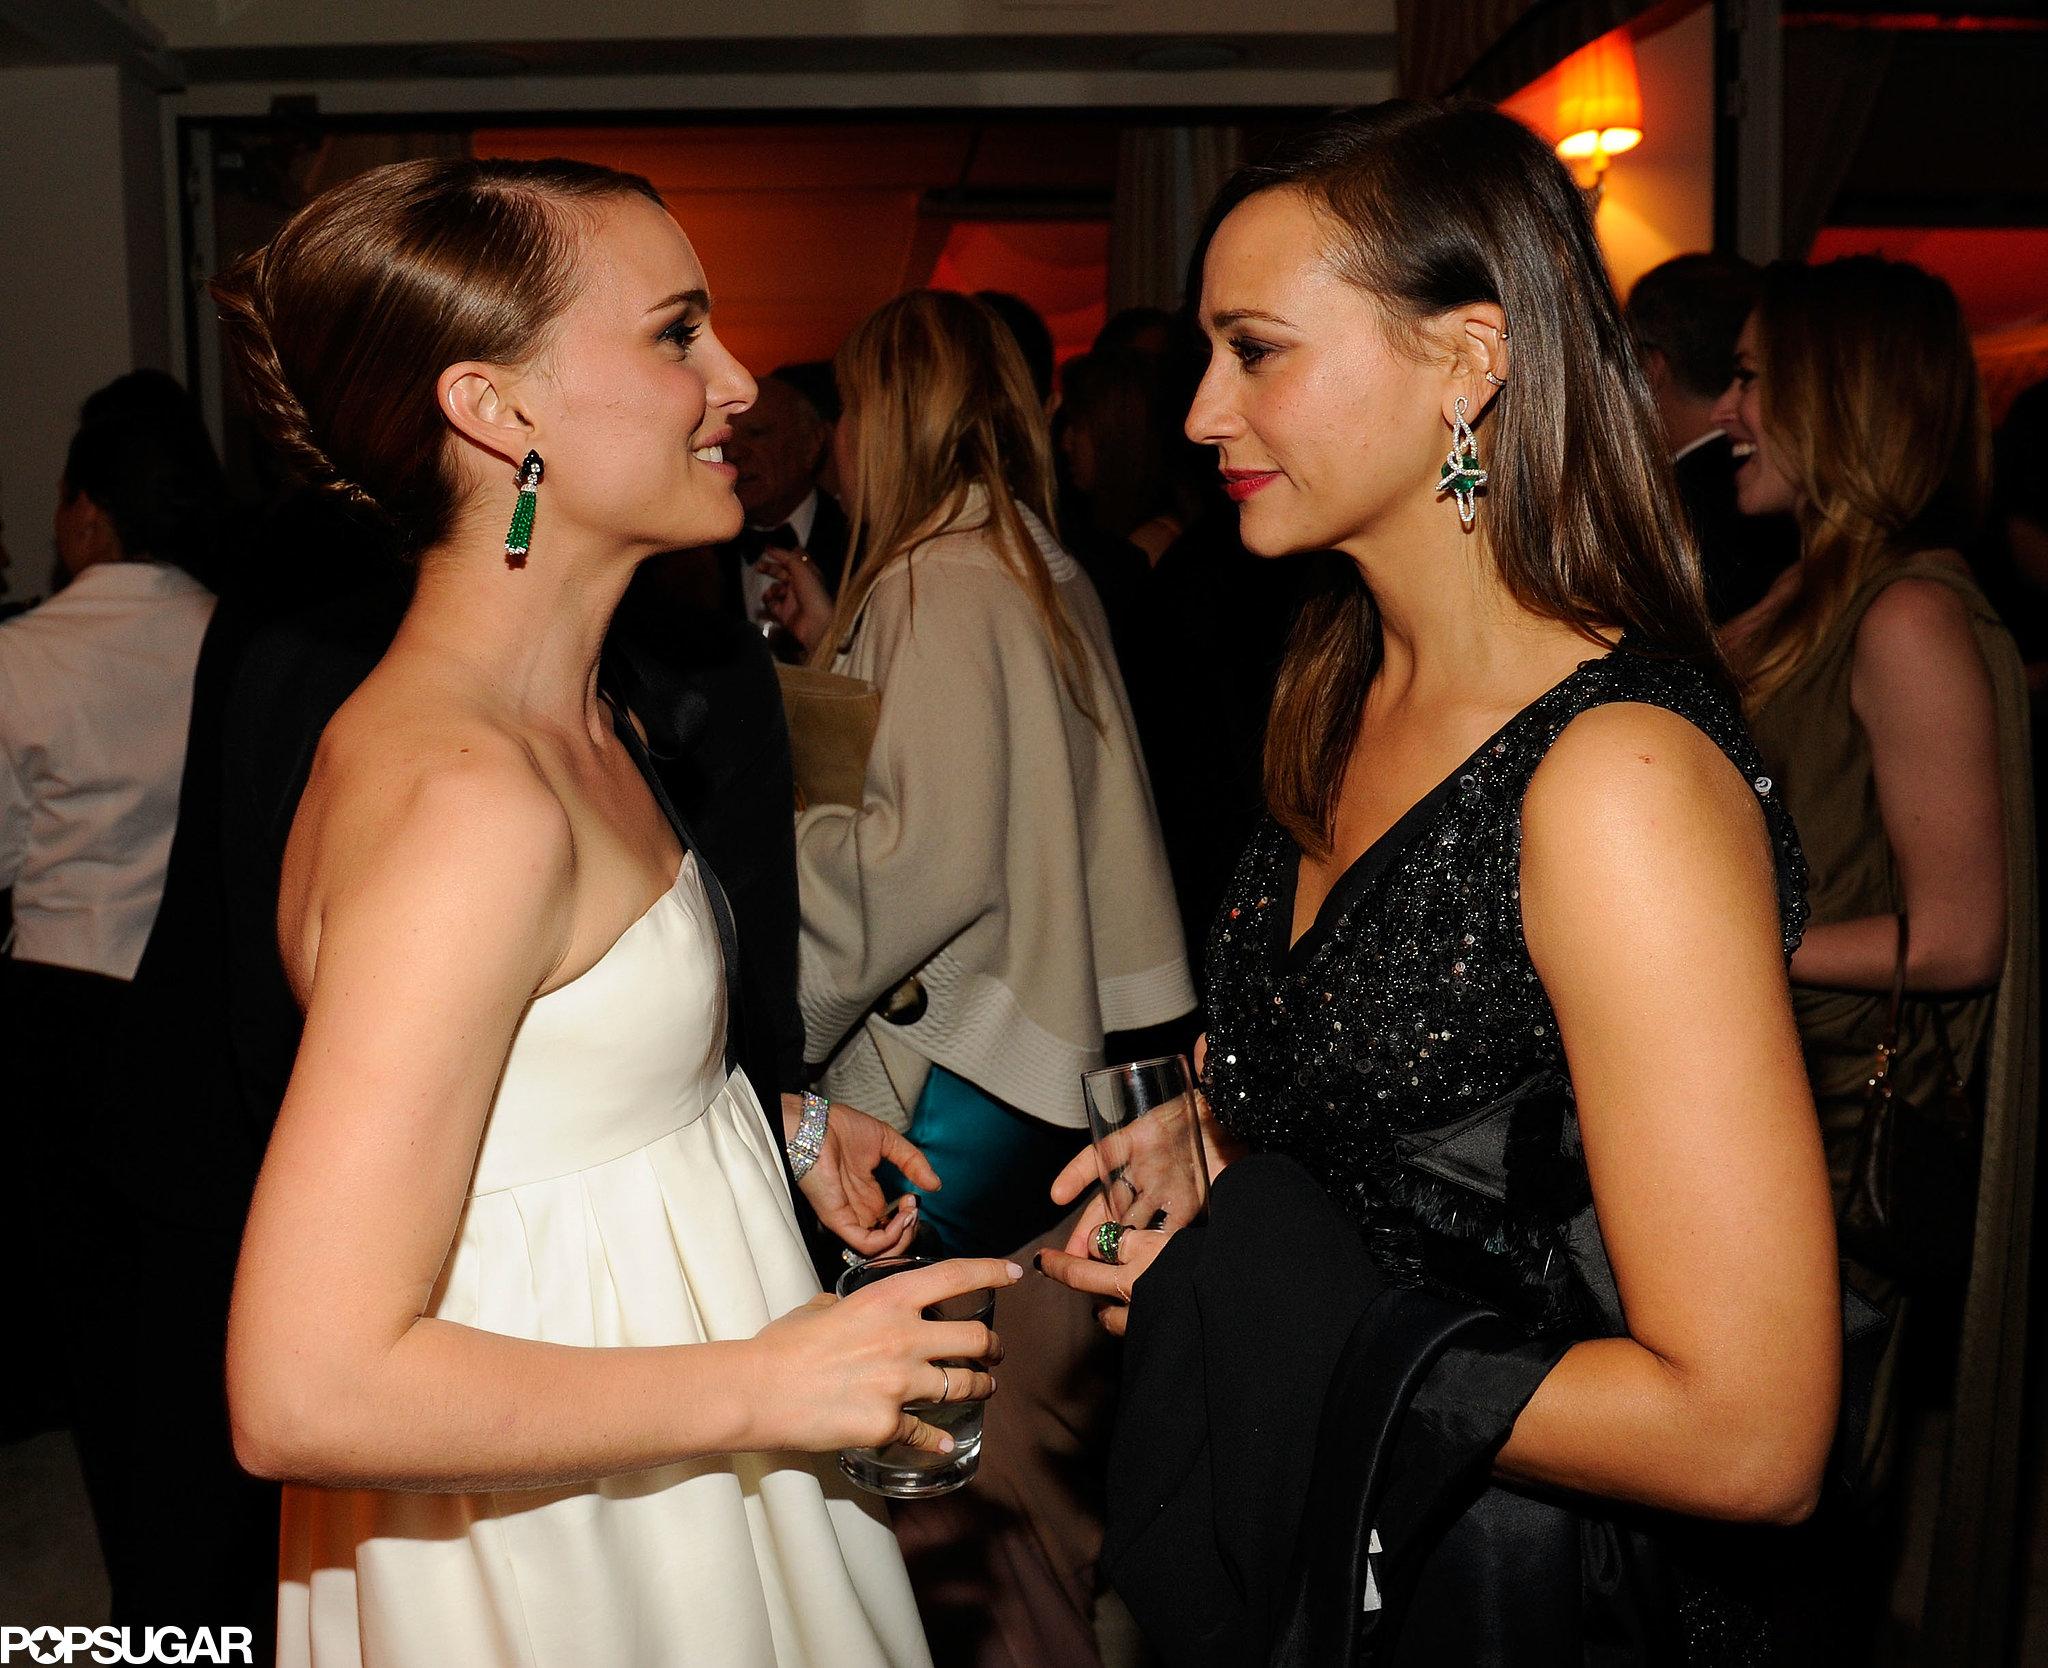 Harvard girls Natalie Portman and Rashida Jones chatted at Vanity Fair's Oscar afterparty.